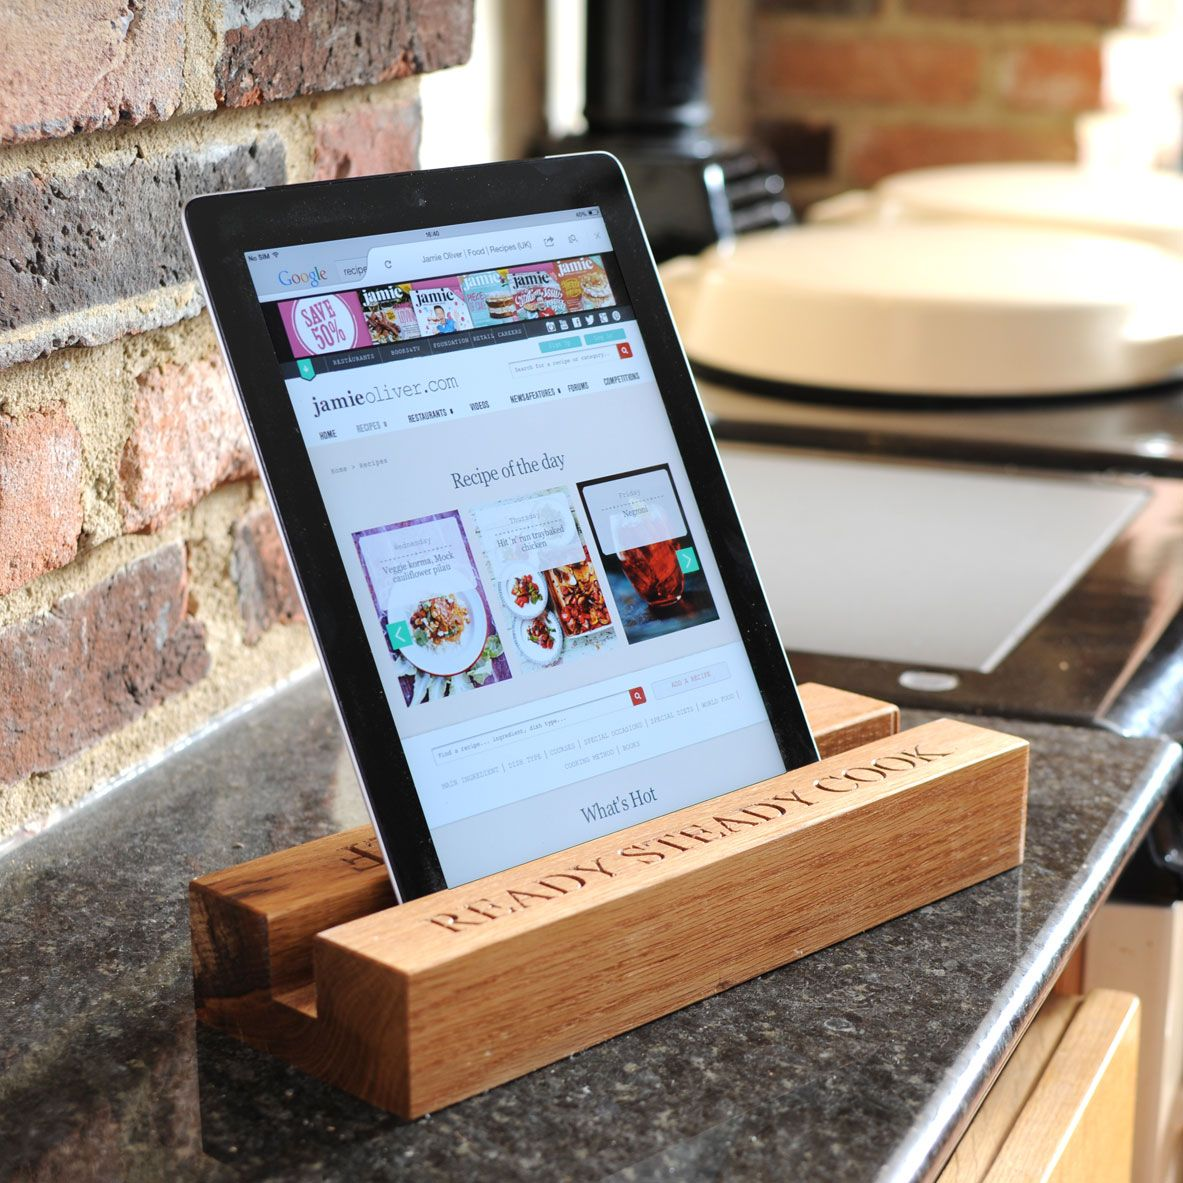 Kitchen Diy Wooden Receipe Stand Kitchen Tablet Holder Black Marble  Countertop Brick Stone Wall White Oak